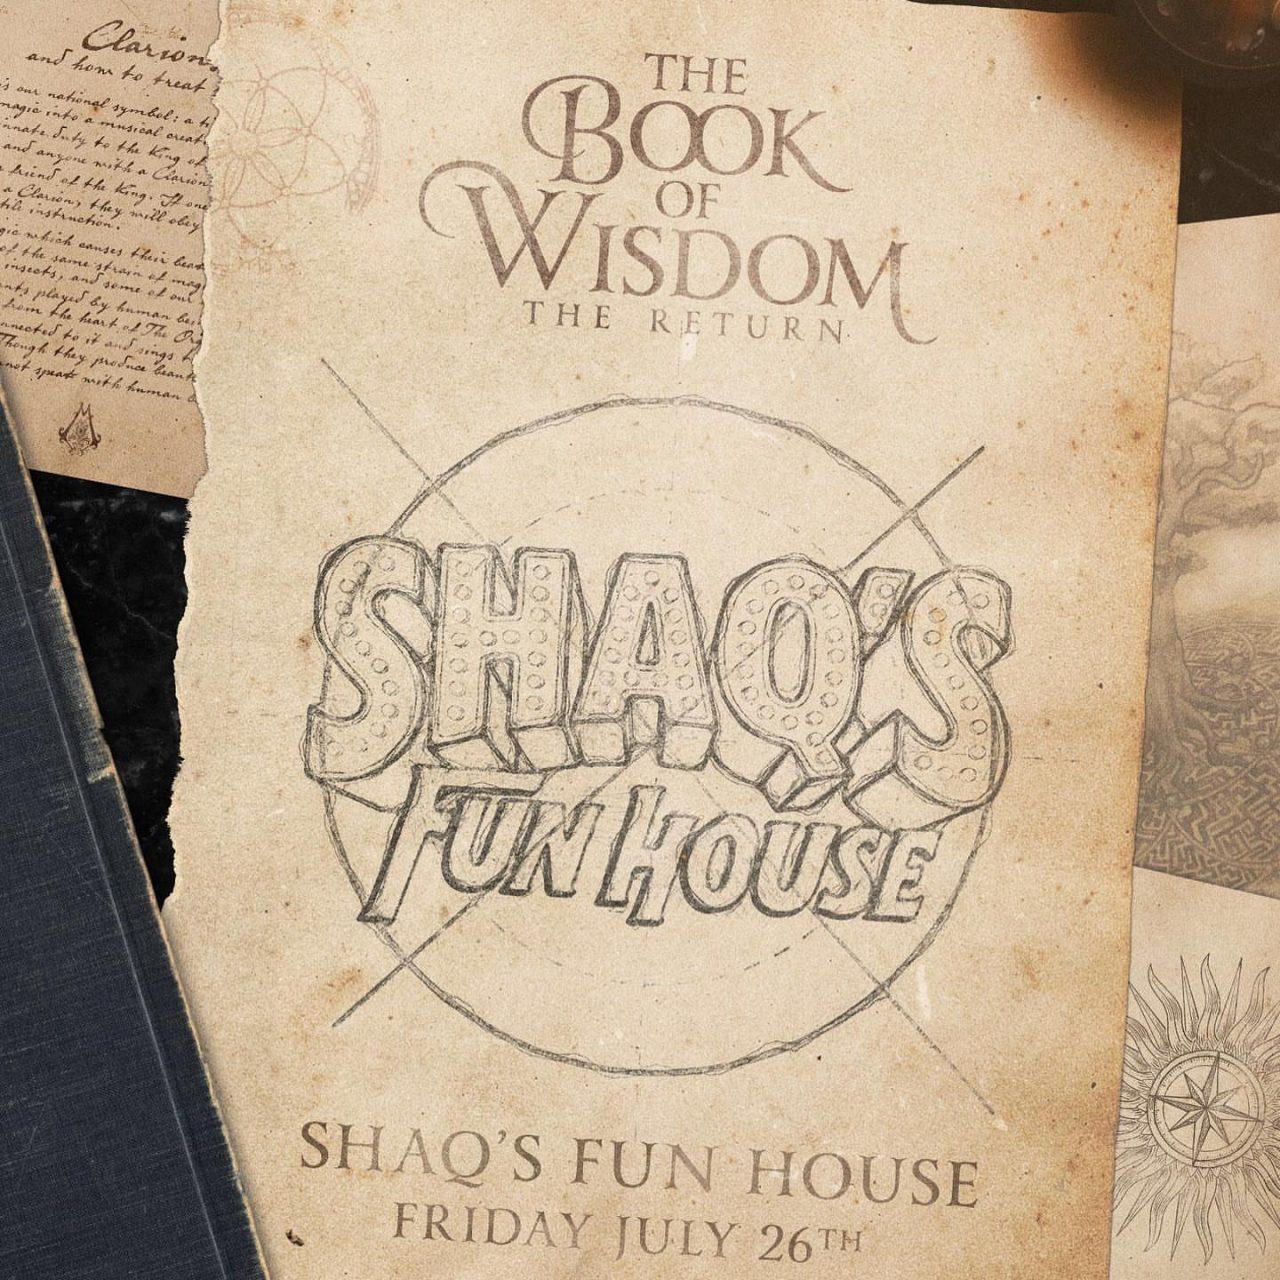 https://shaqfuradio.com/wp-content/uploads/2019/06/Shaqs-fun-house-tomorrowland-shaq-fu-radio-1280x1280.jpg